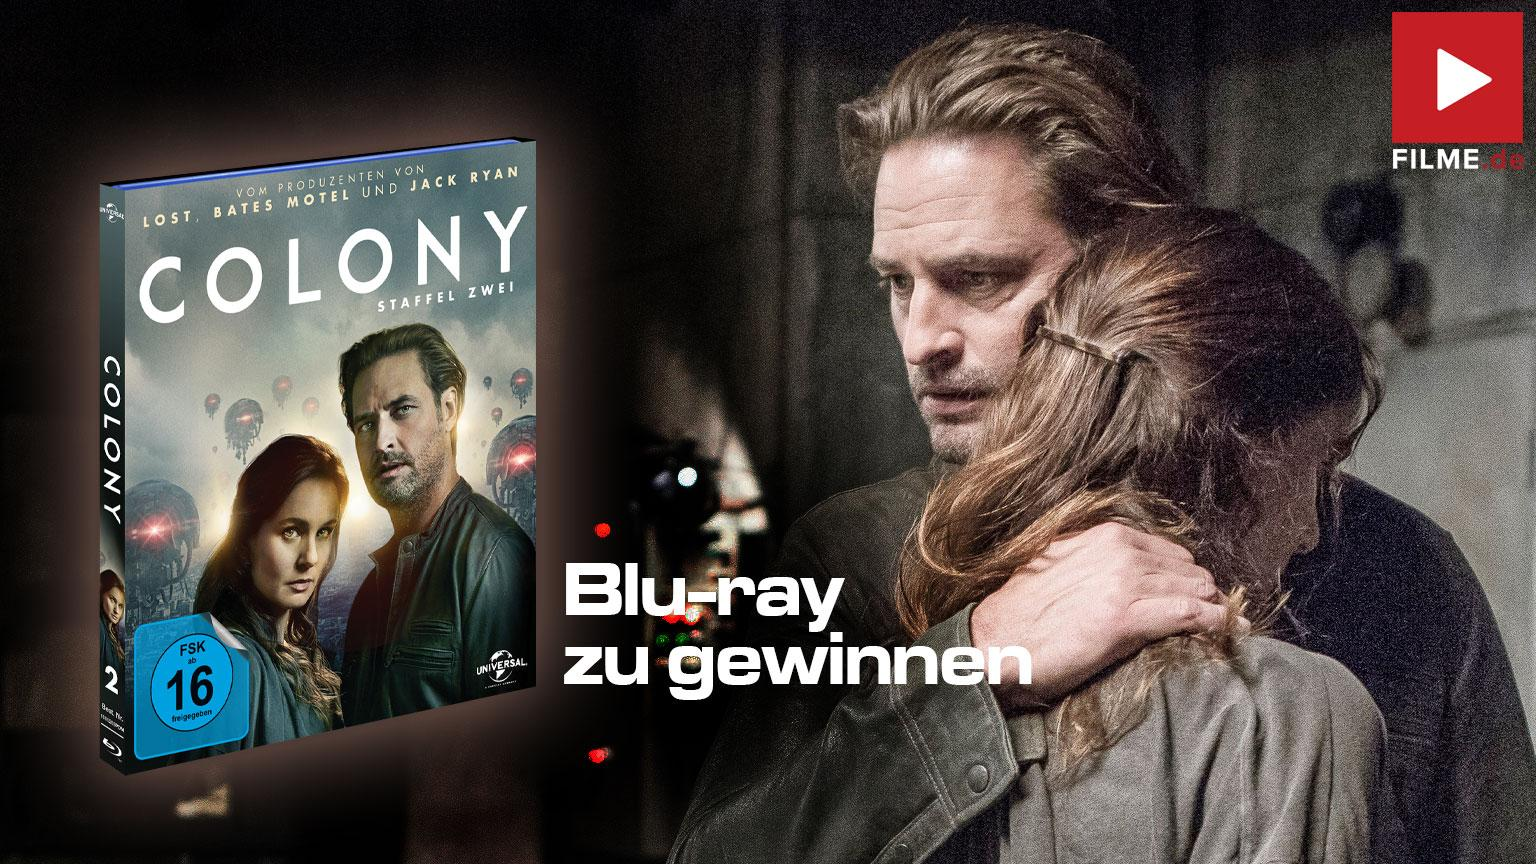 Colony Staffel 2 Gewinnspiel Artikelbild gewinnen shop kaufen Review Kritik